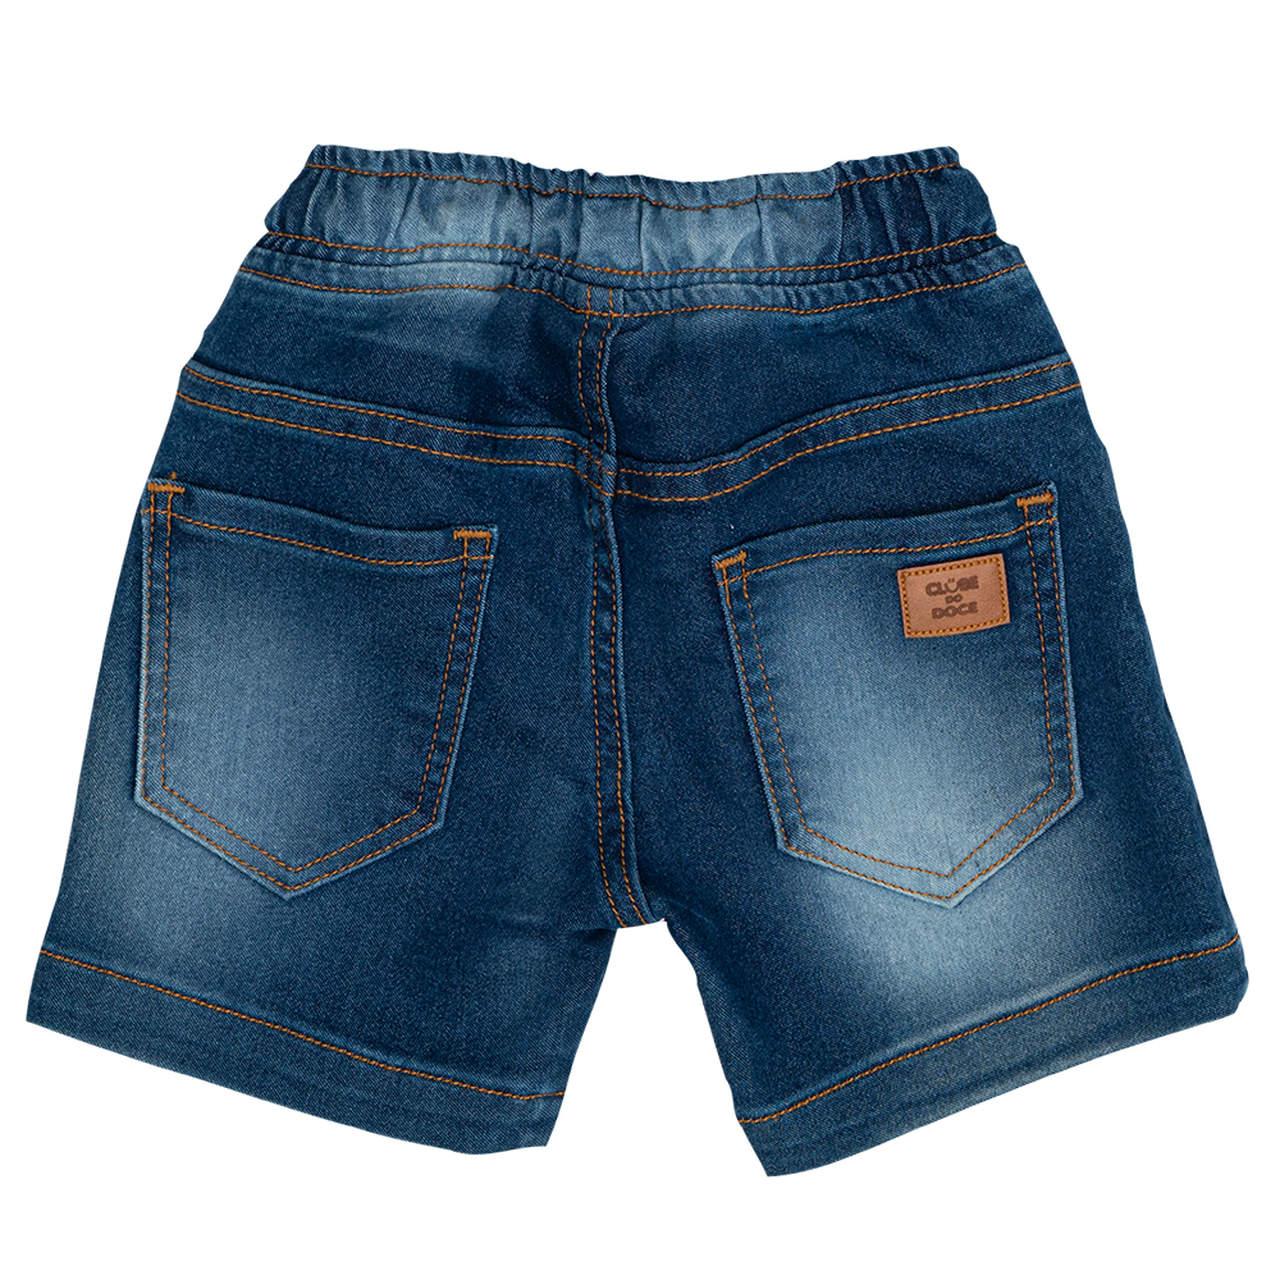 Bermuda Jeans Clube do Doce Cós Clube do Doce